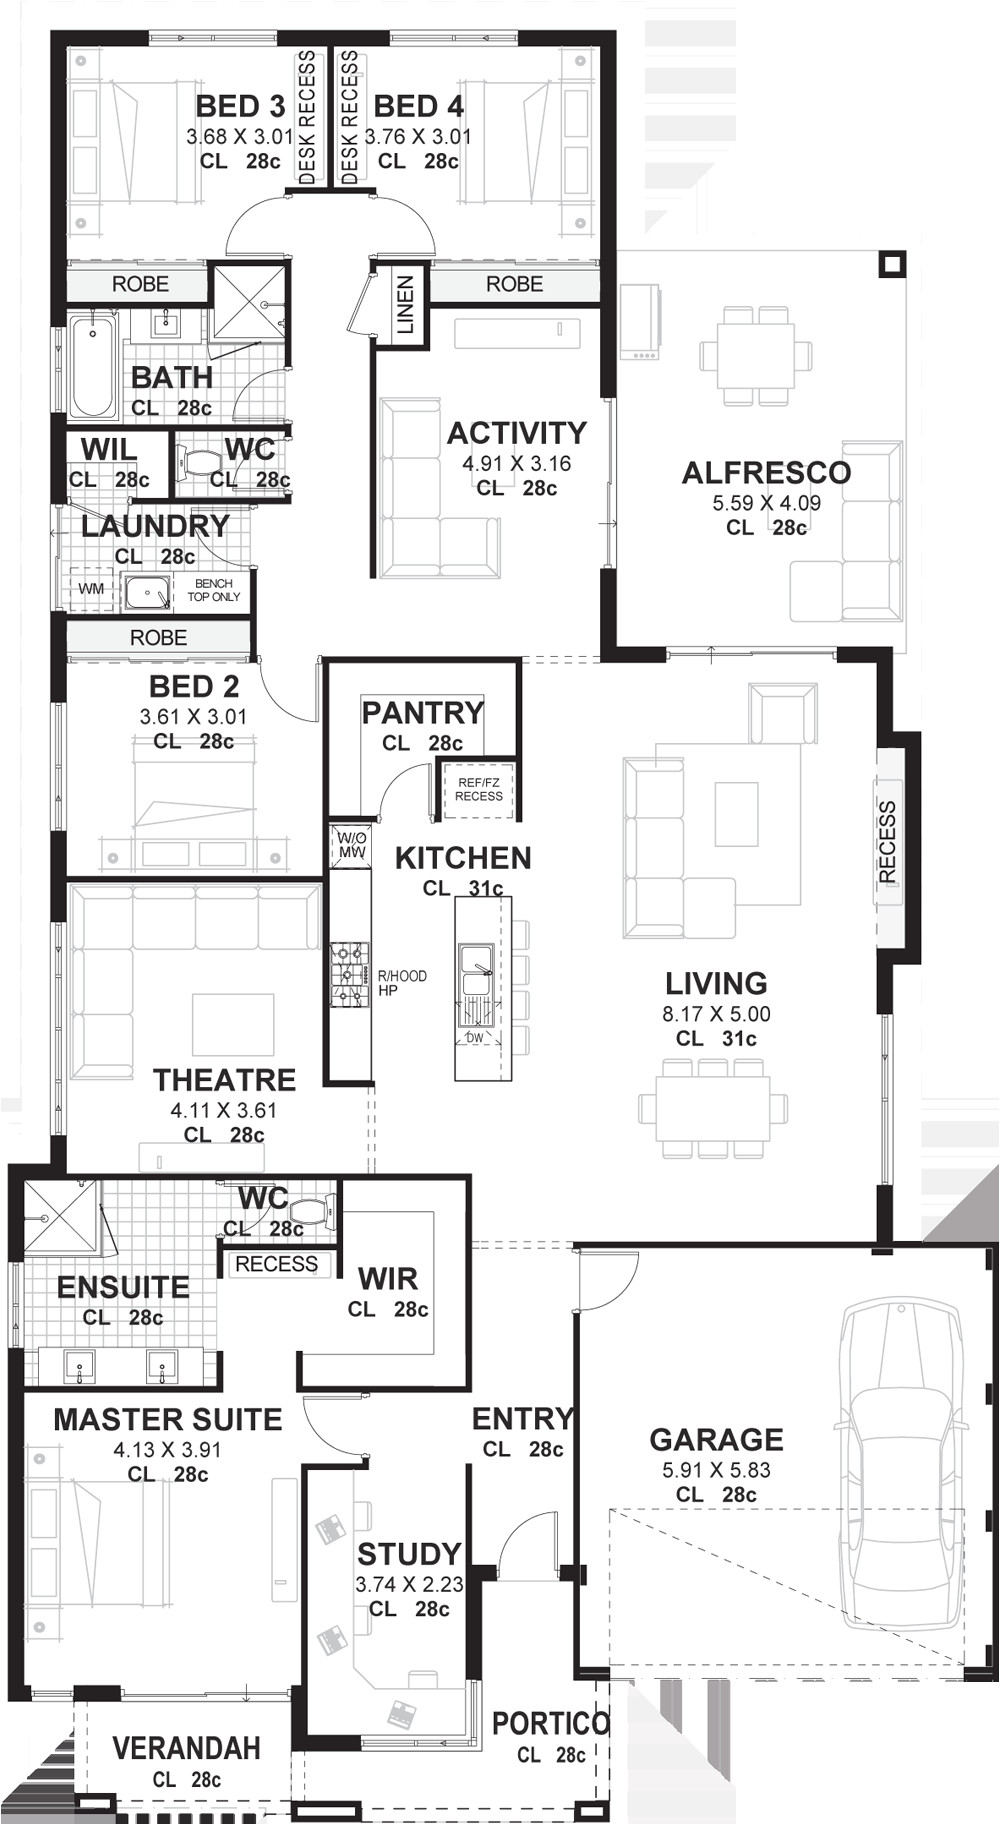 4 bedroom house plans designs